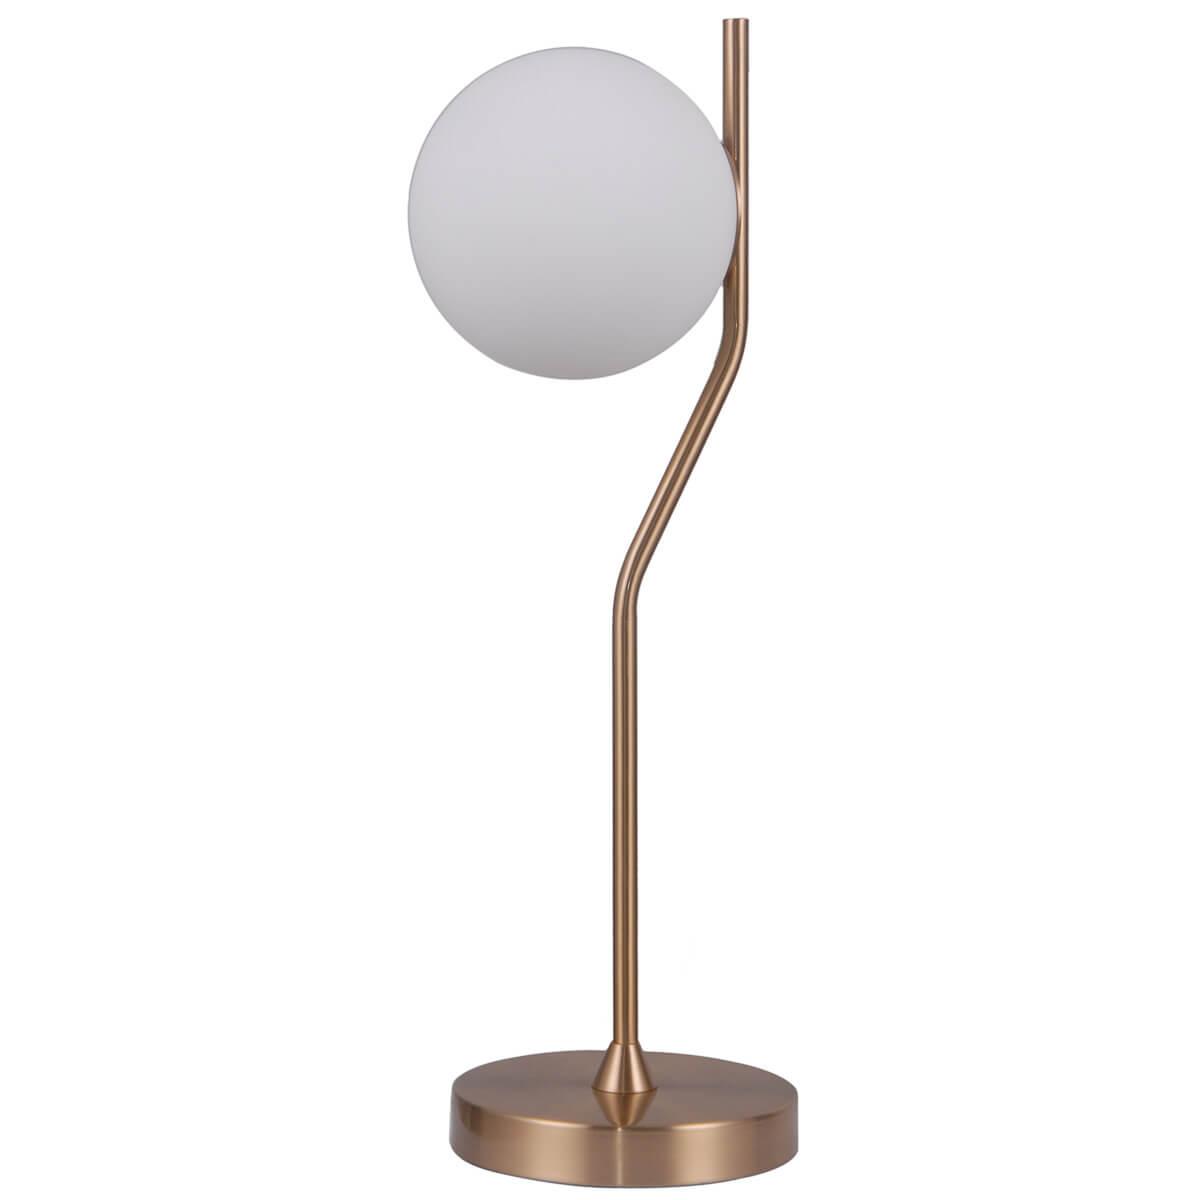 Настолна лампа Carimi TB-3300-1-HBR